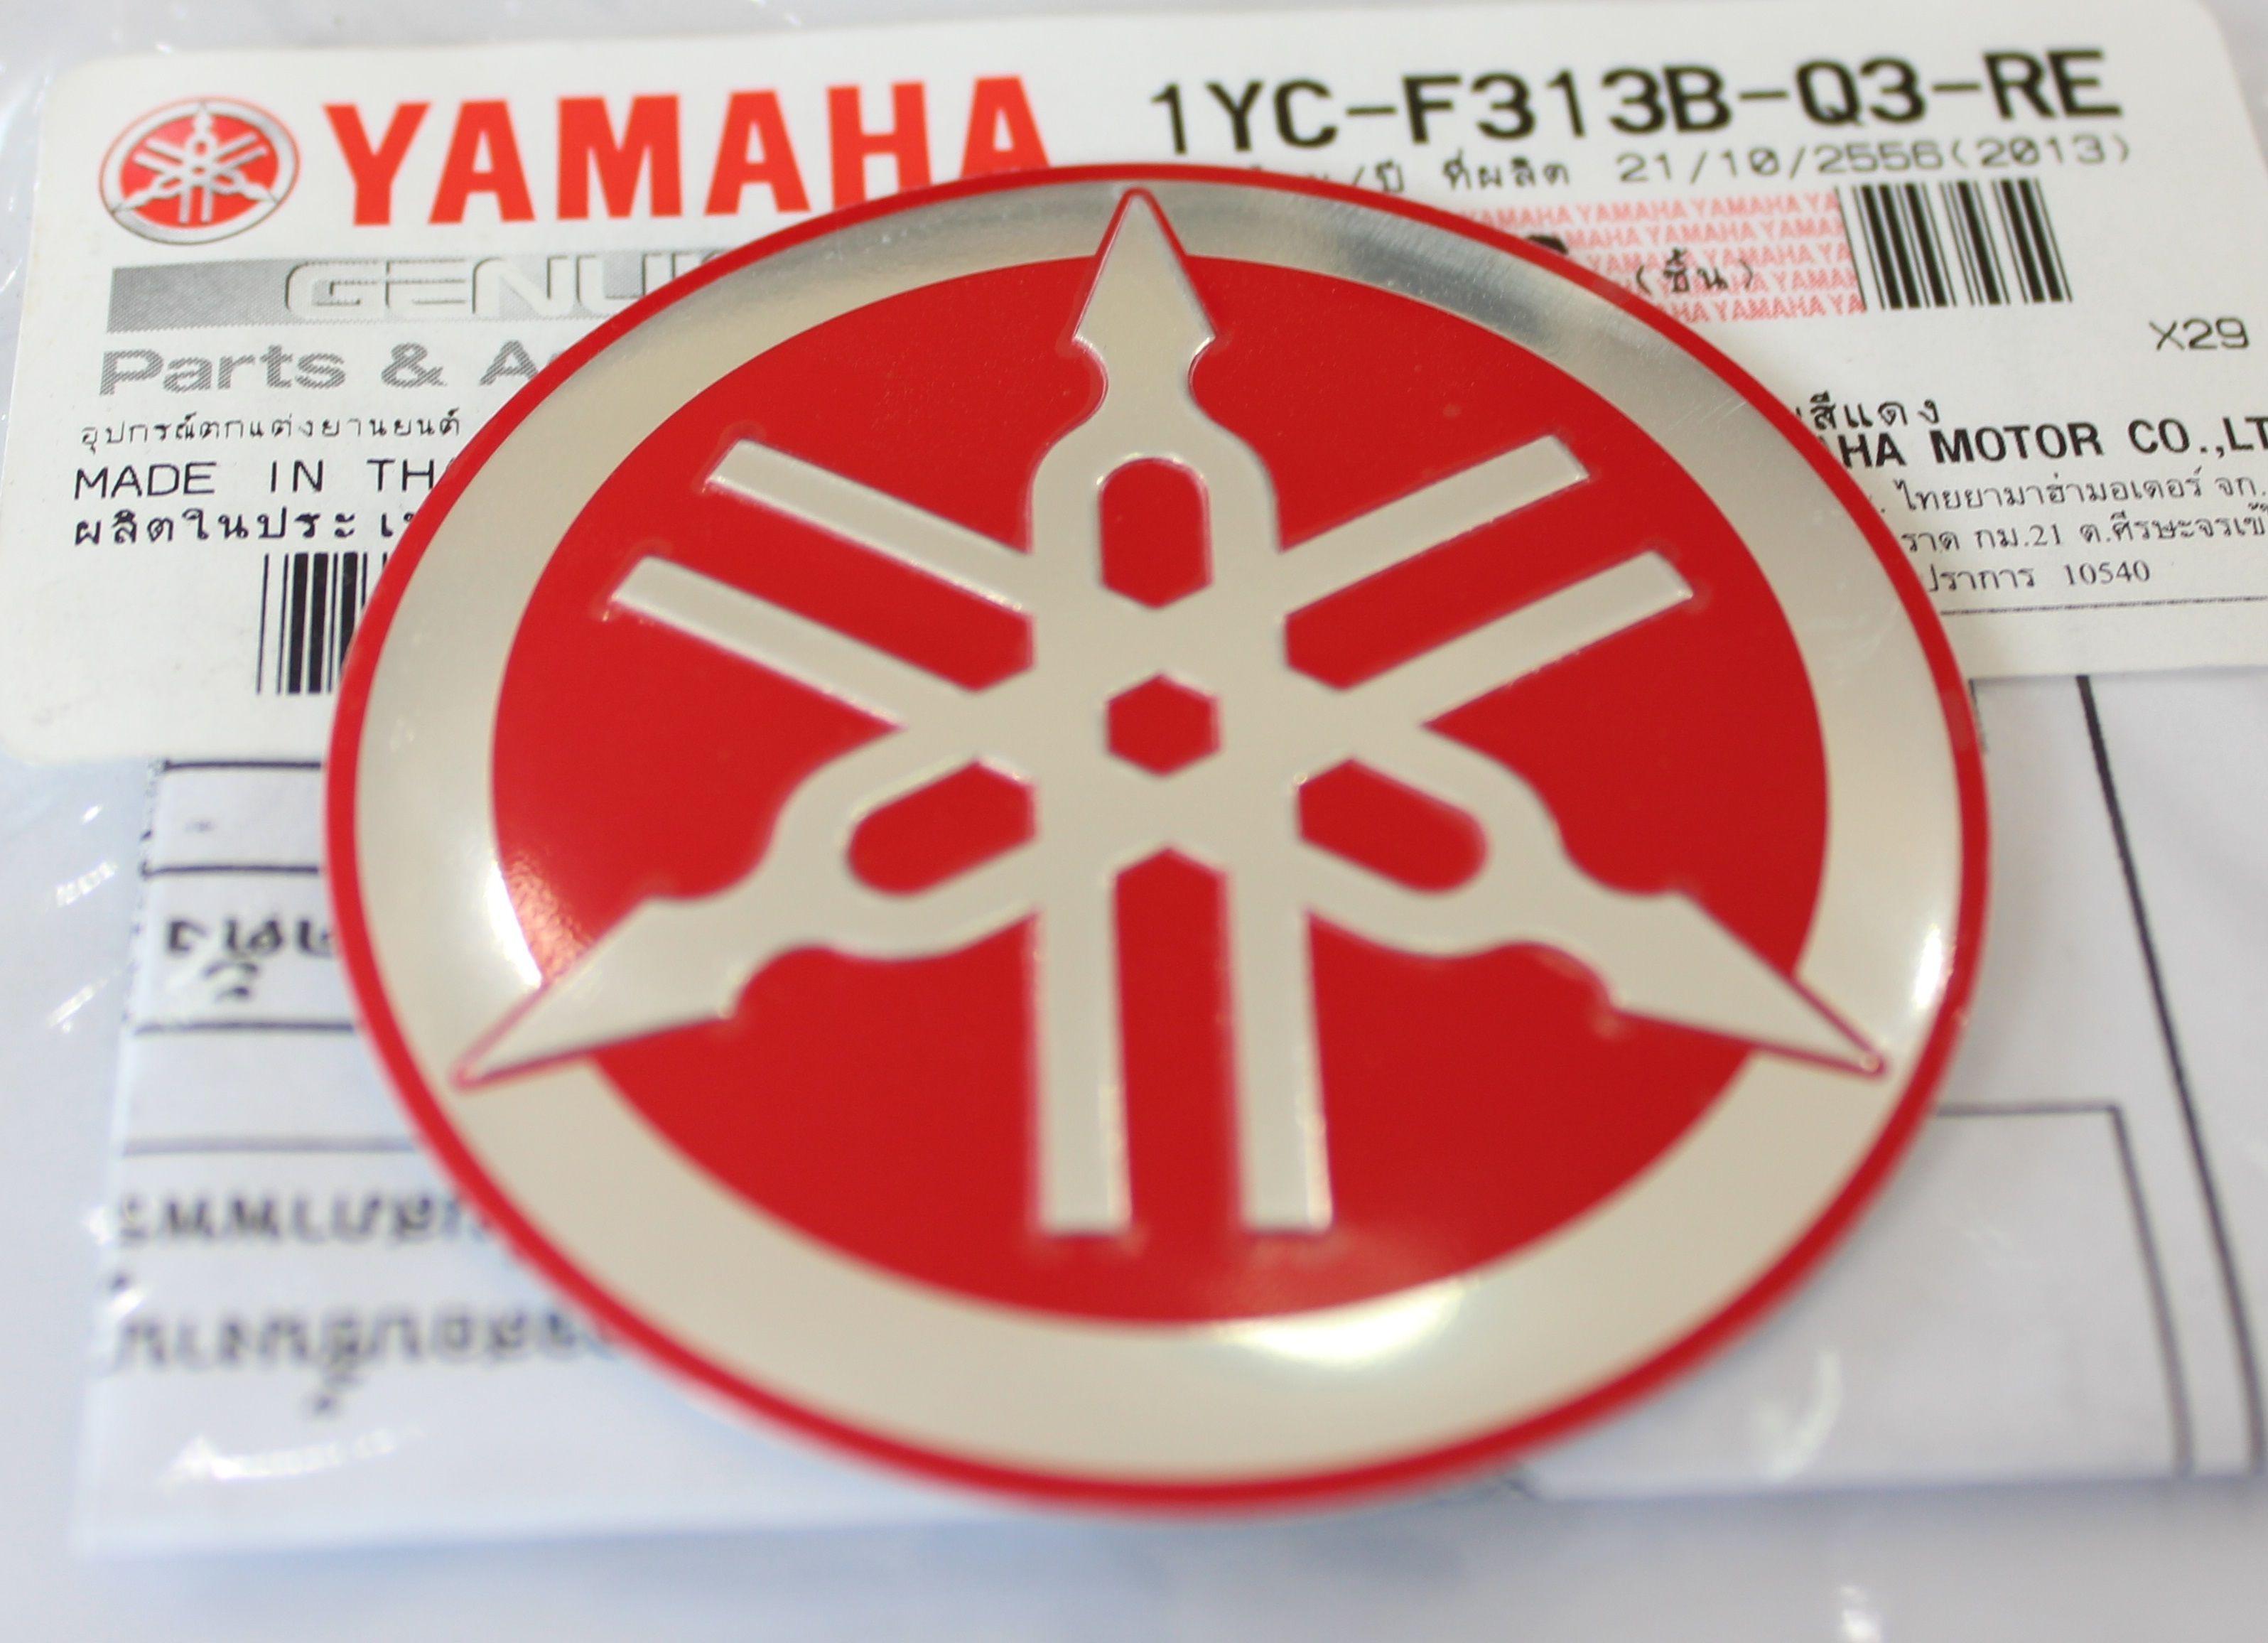 2 x YAMAHA 100/% GENUINE 40mm TUNING FORK RED DECAL EMBLEM STICKER